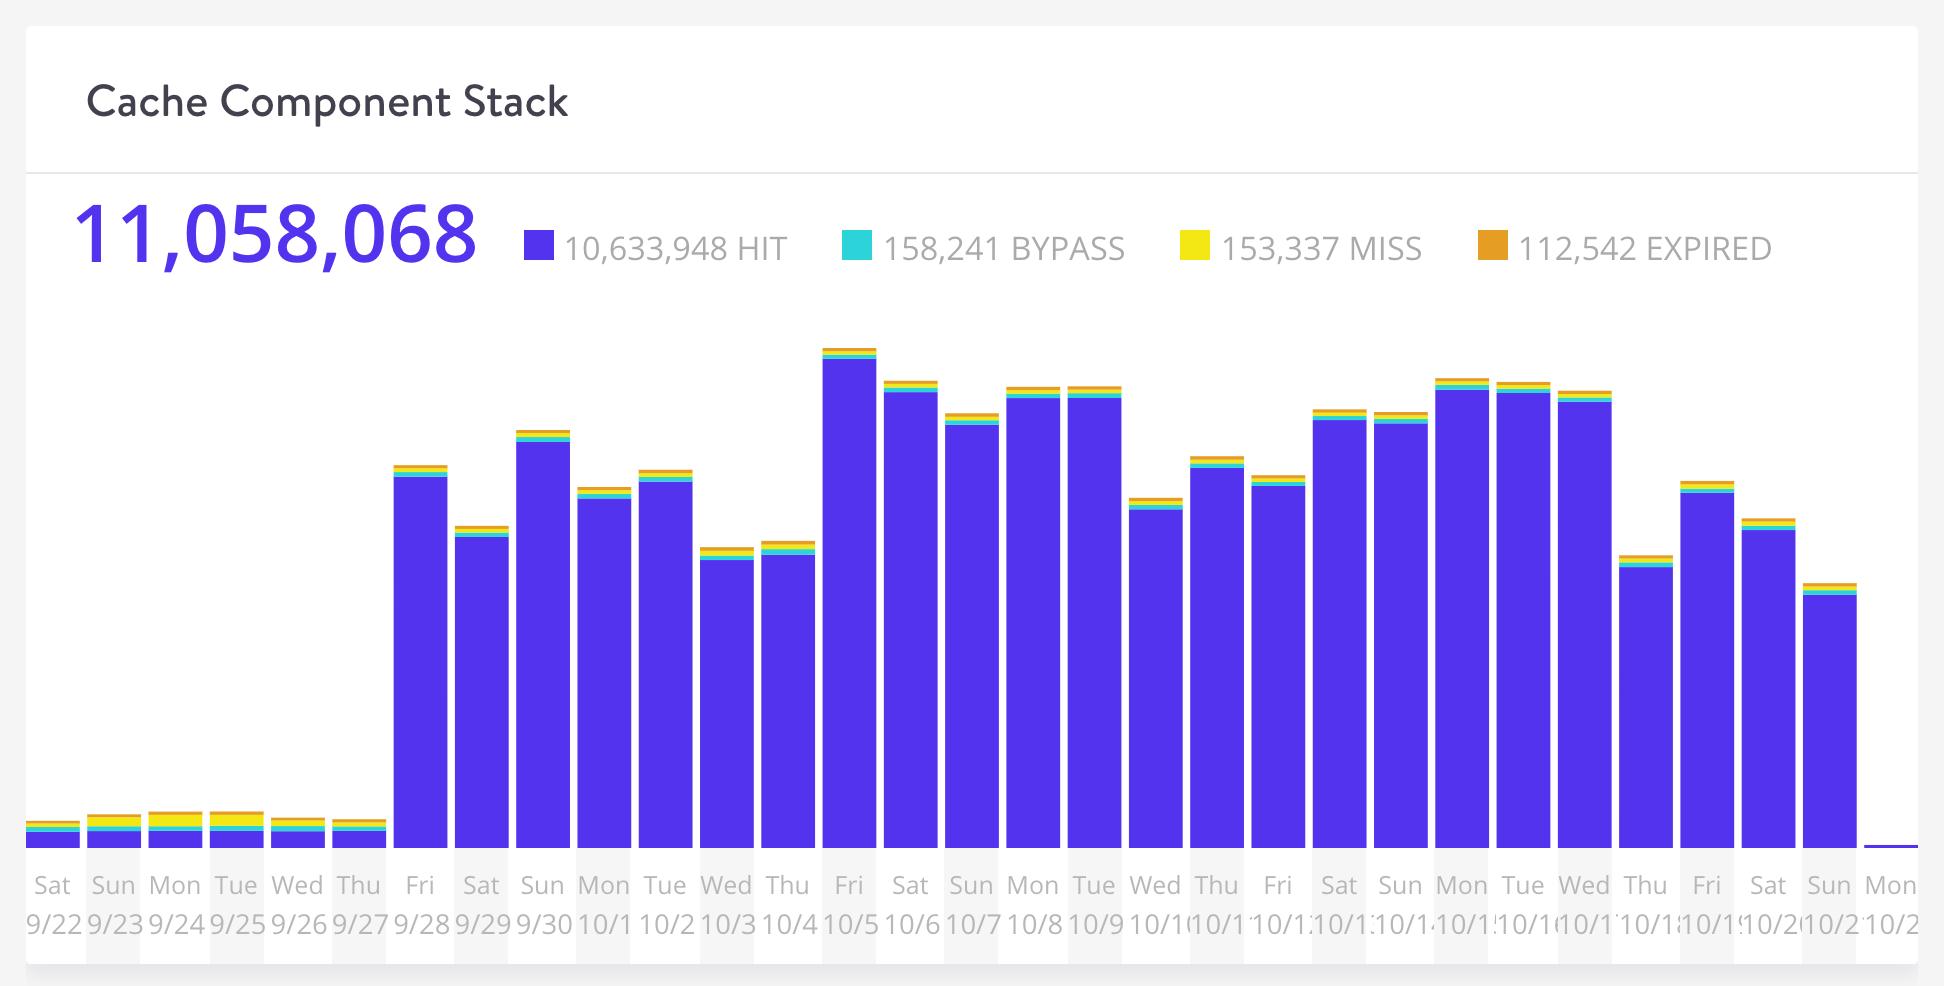 Kinsta cache component stack